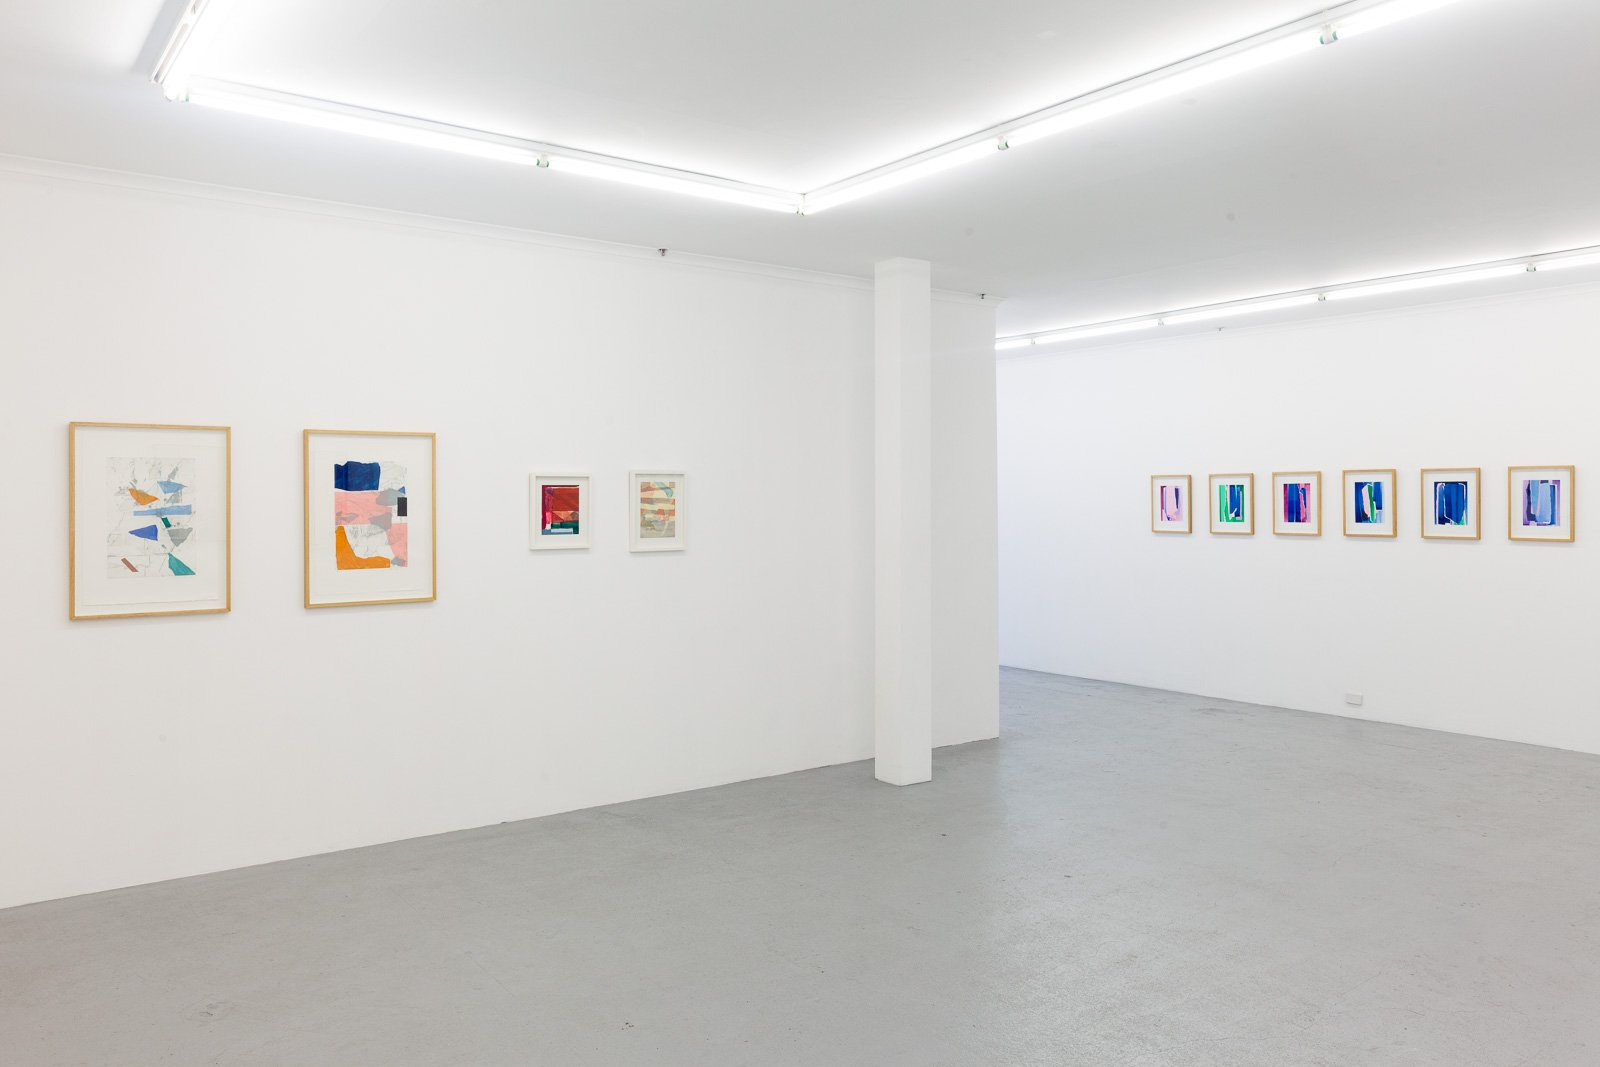 L: Mason Kimber R: Scott Gardiner, installation view image